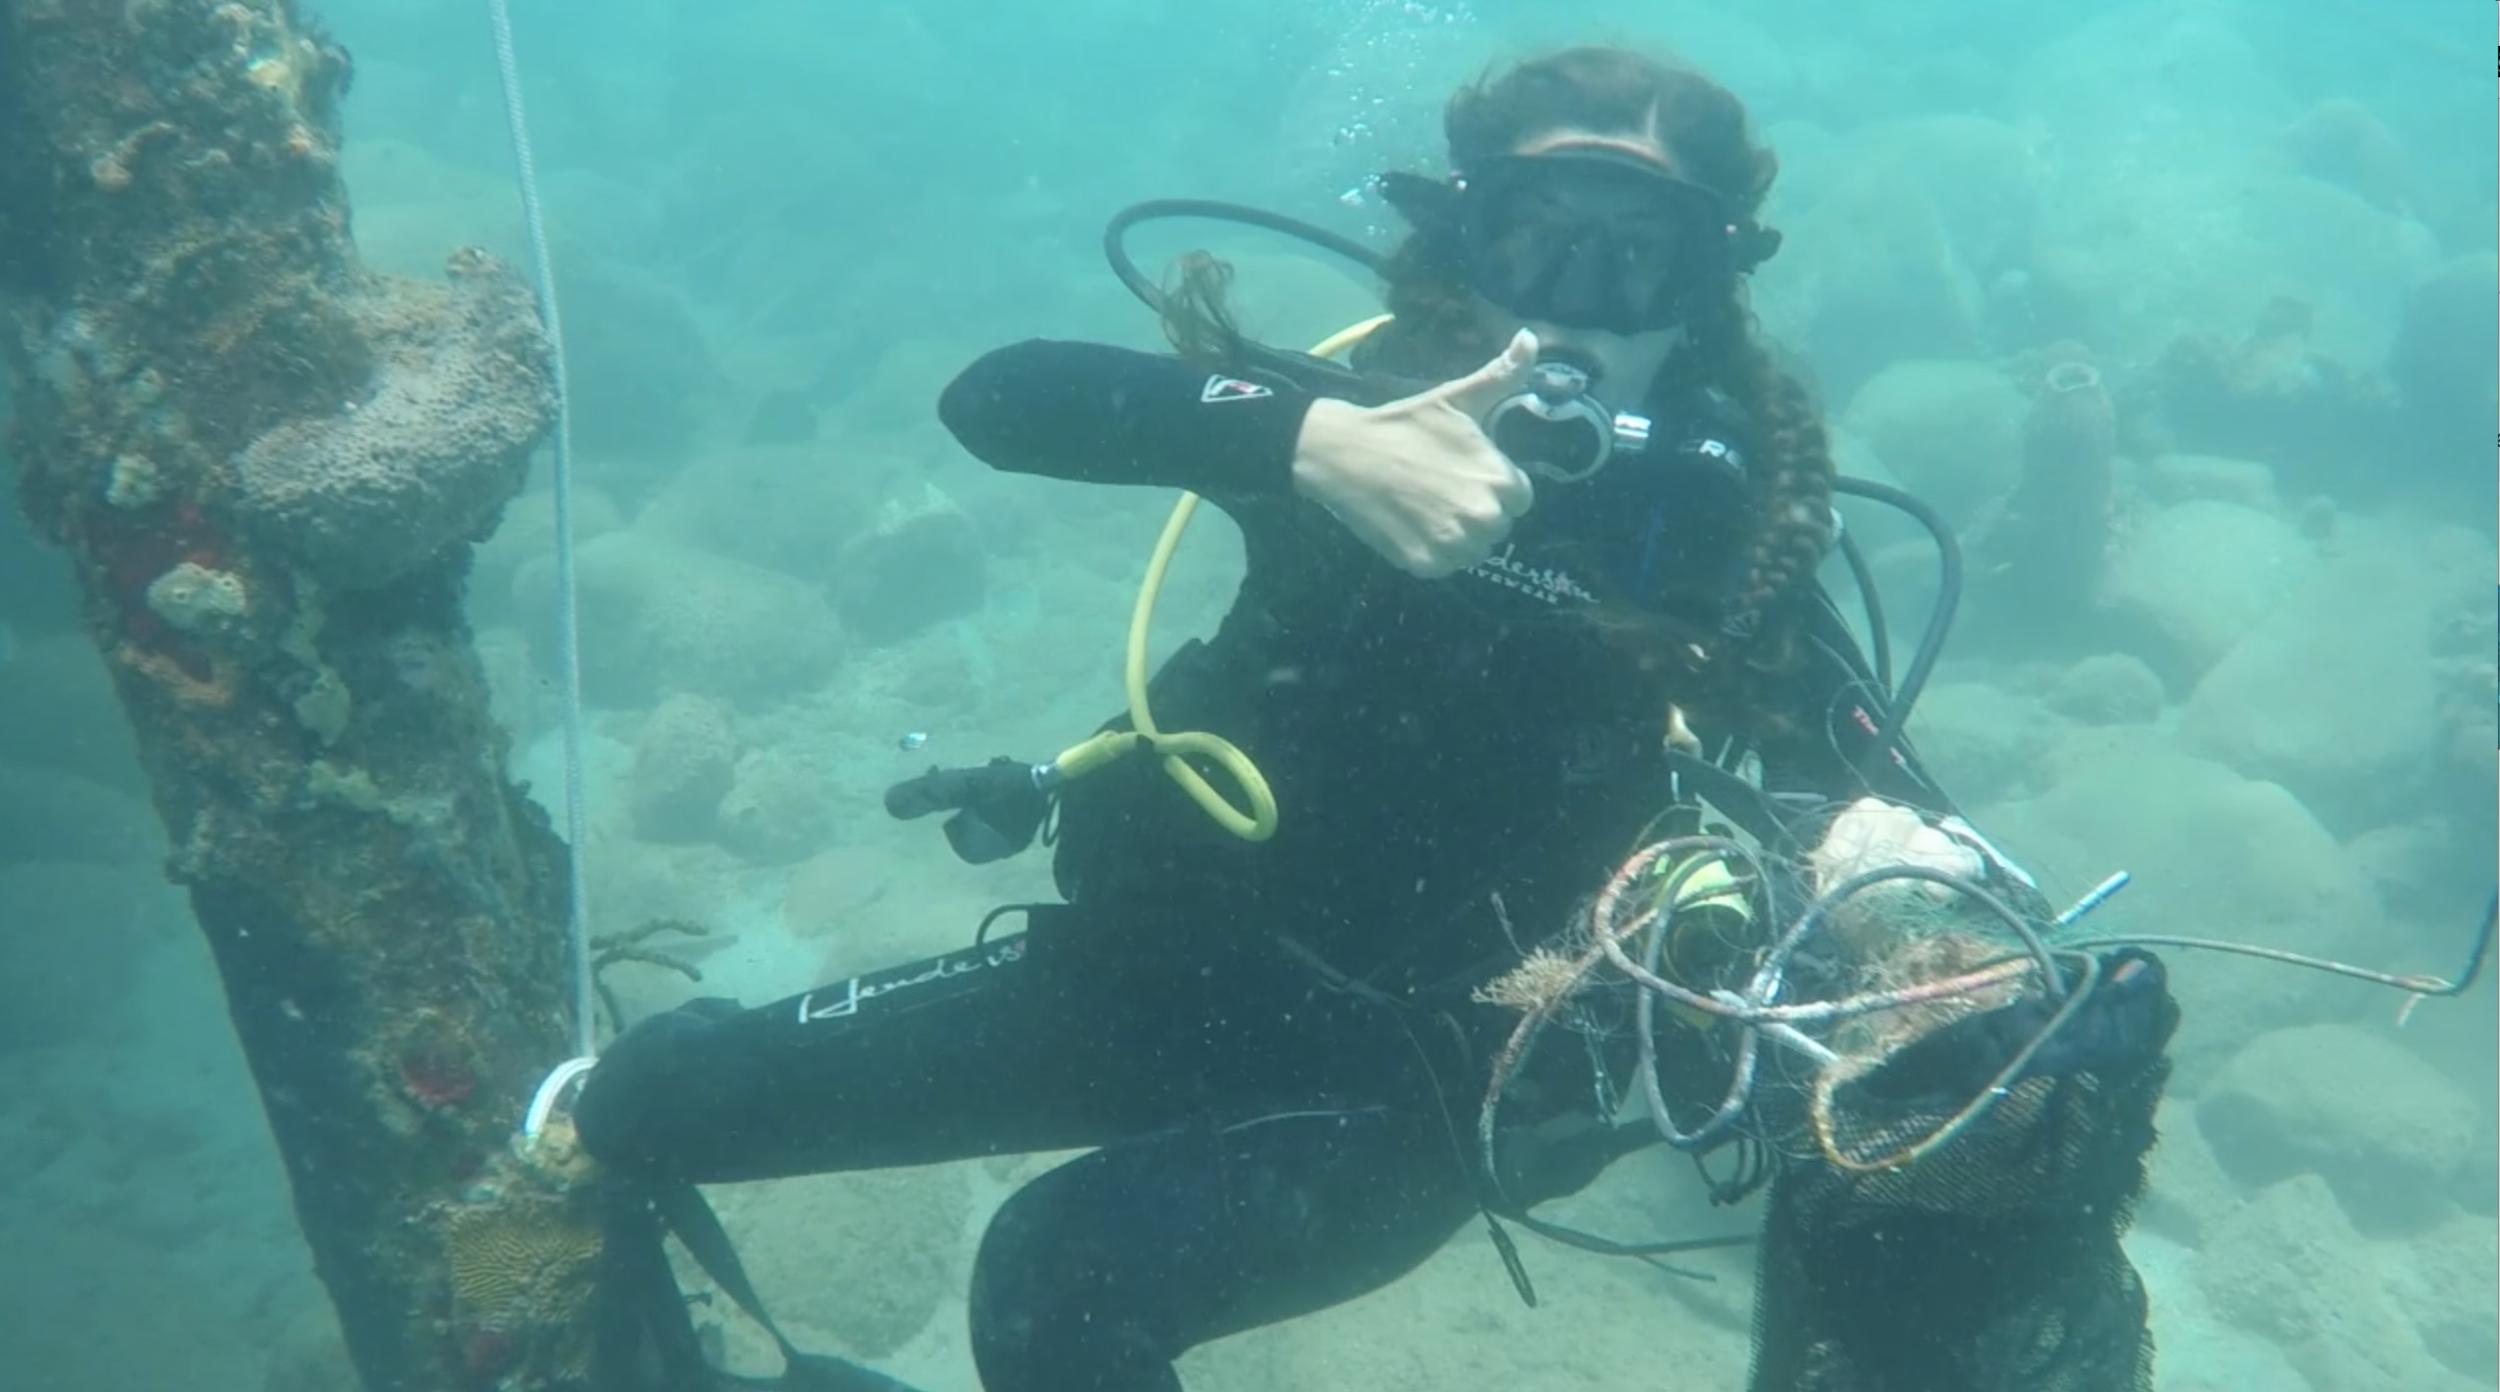 kayla going up salt scuba dive dominica dive against debris padi project aware .png